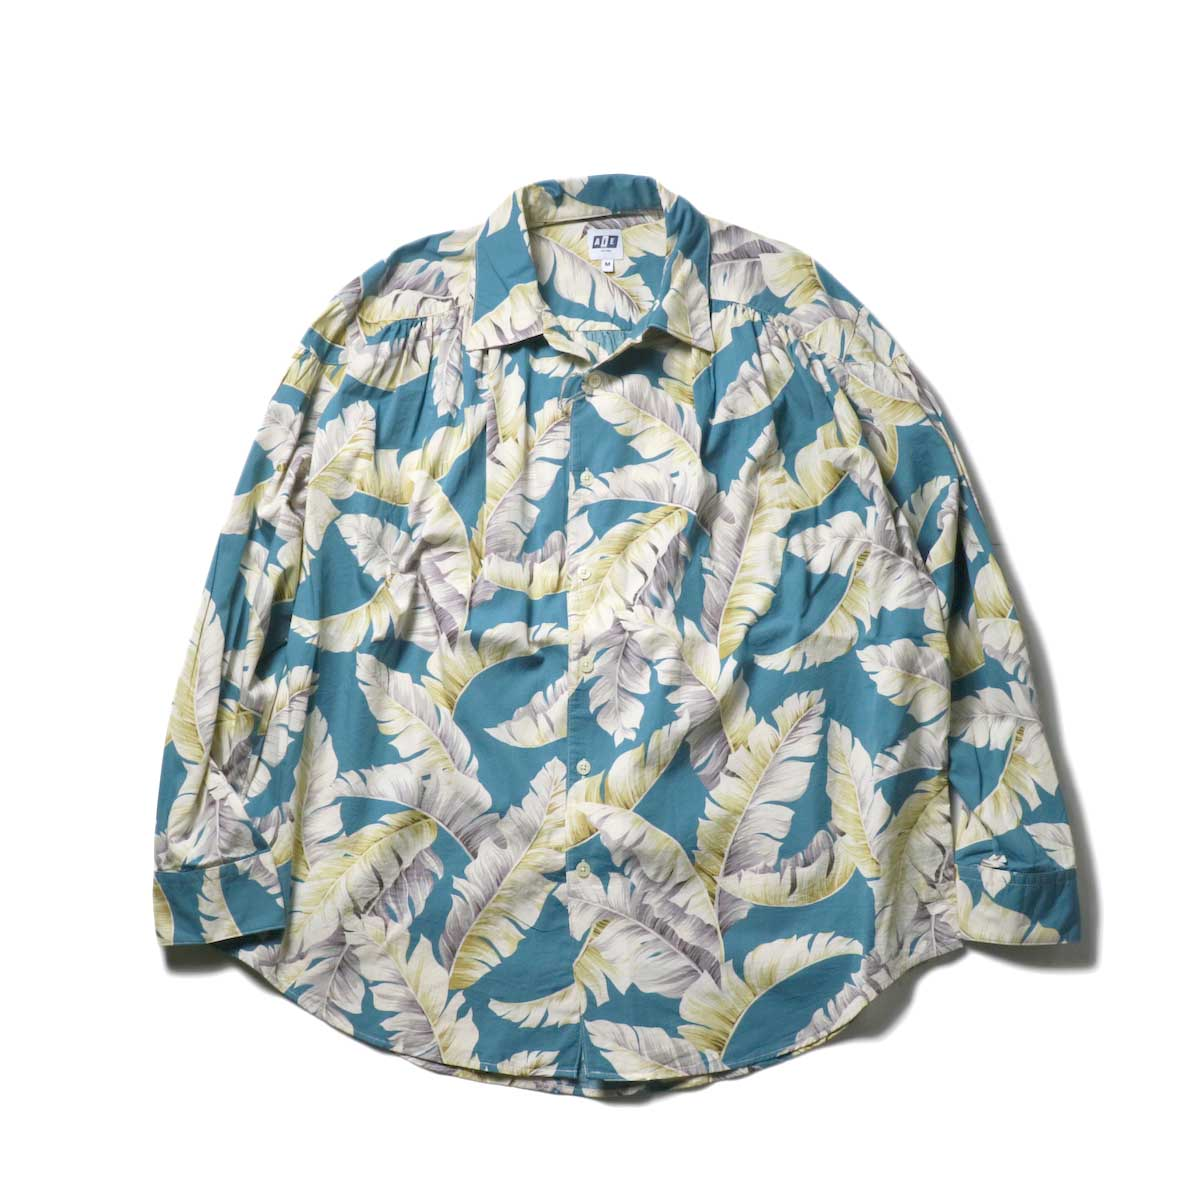 AiE / Painter Shirt - Hawaiian Print (Turquoise)